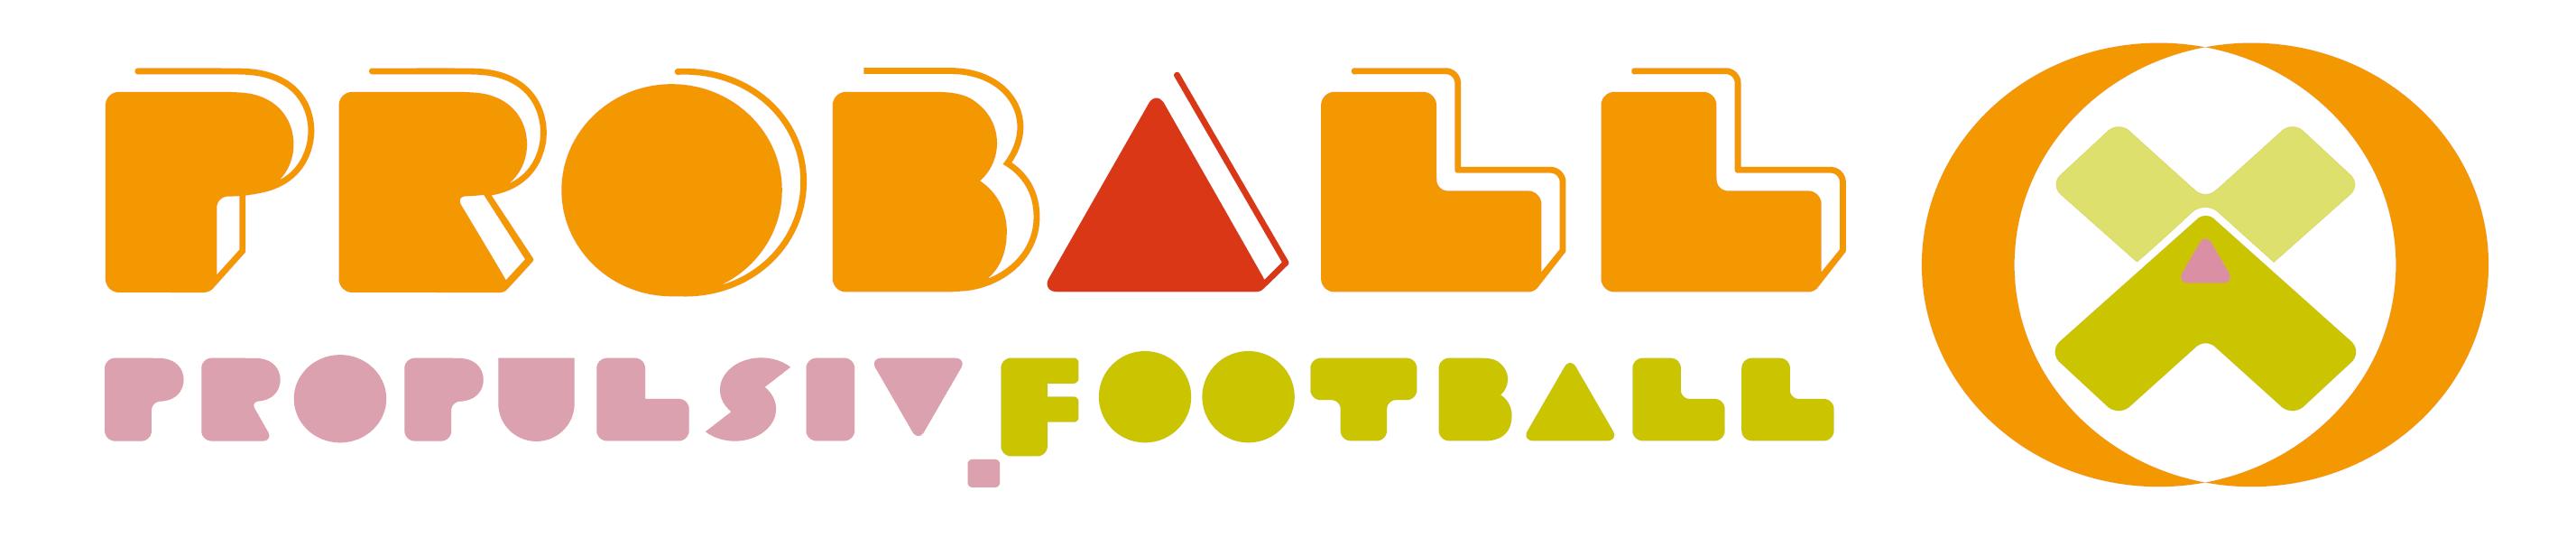 Propulsive Football